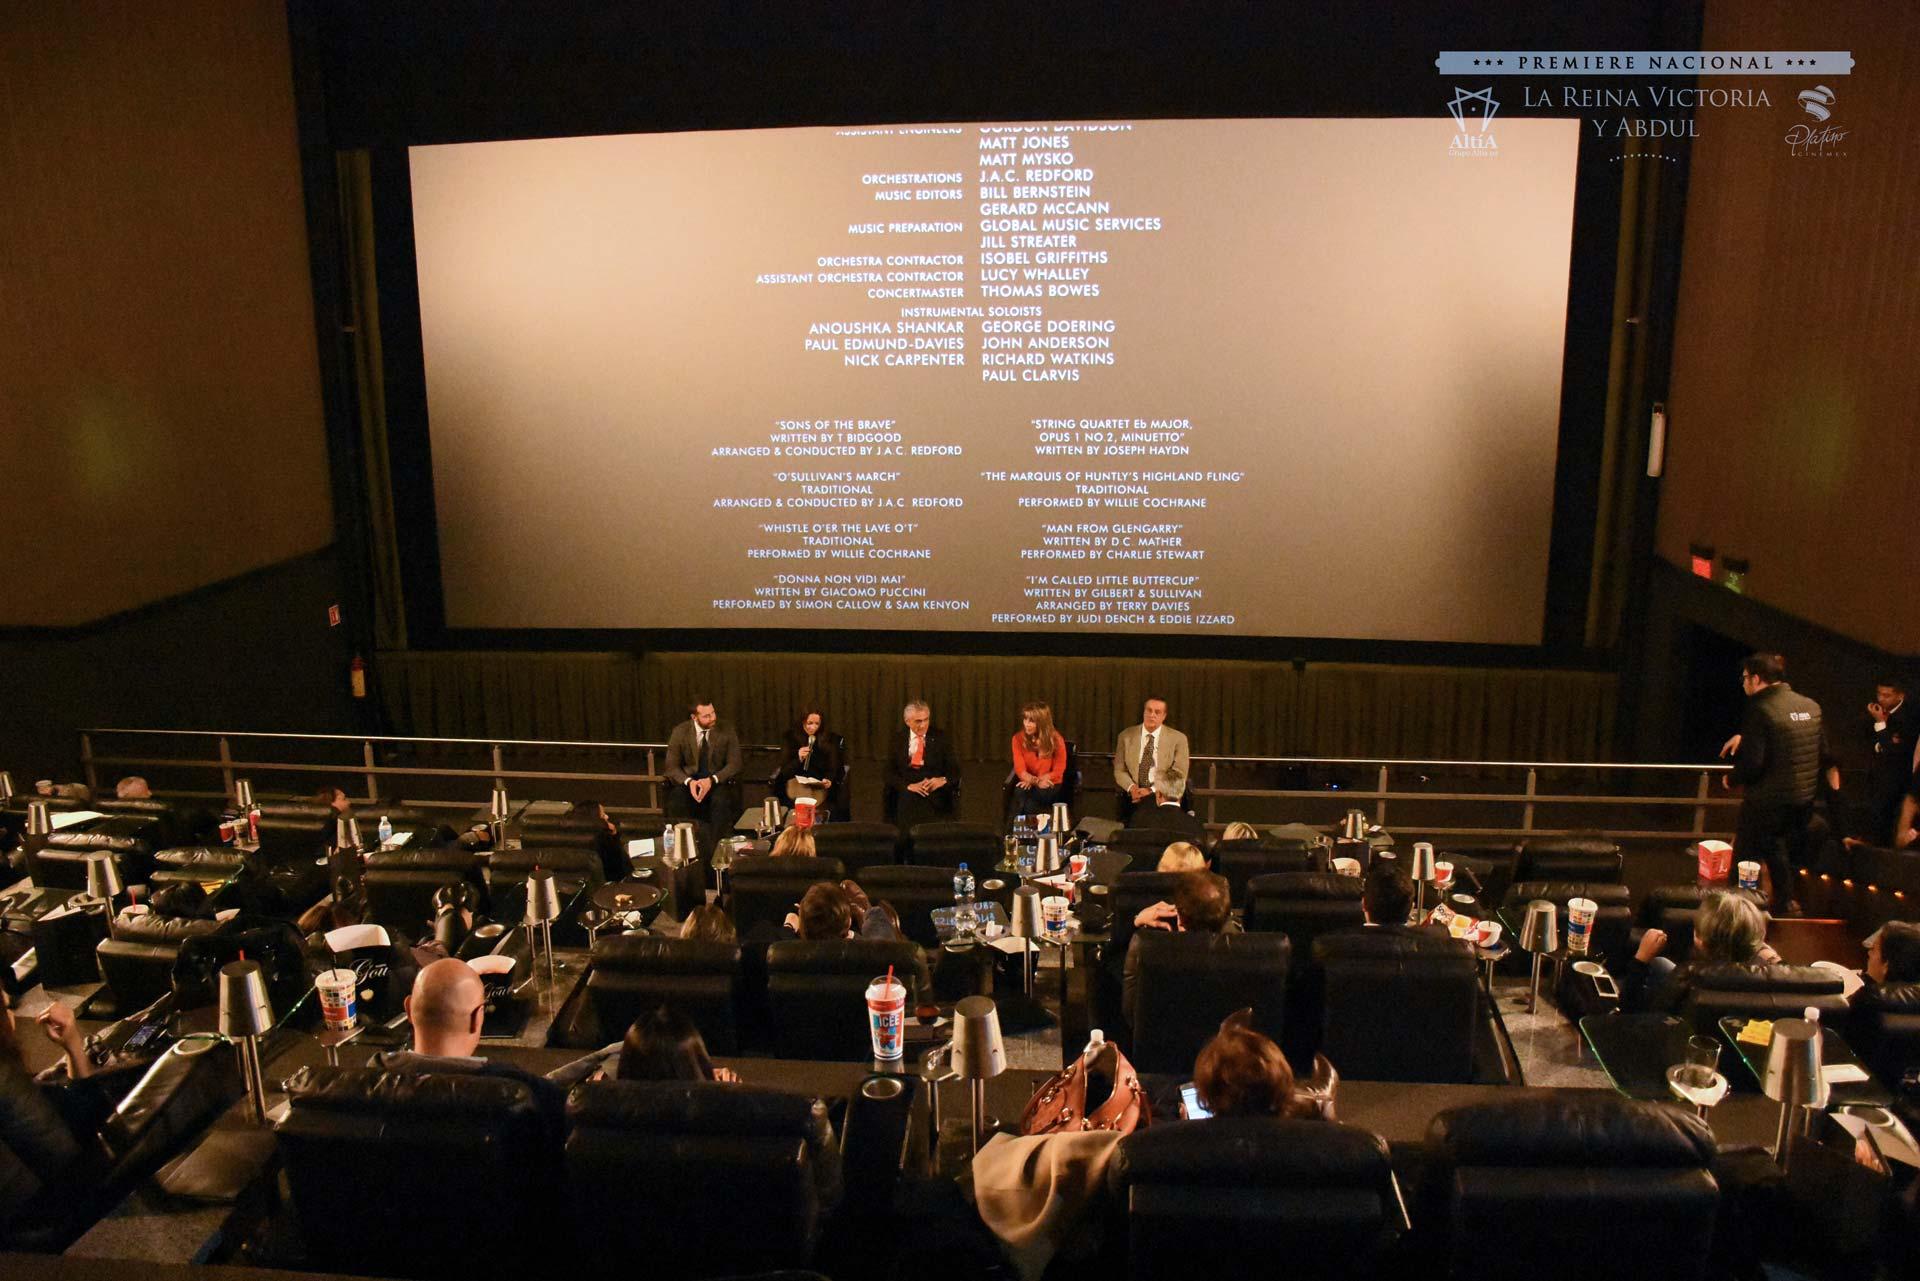 <h3>Grupo Altía I.A.P.<br /><strong>Premiere Nacional «La Reina Victoria y Abdul»</strong><br />Cinemex WTC, CDMX. Octubre 24, 2017.</em></h3>